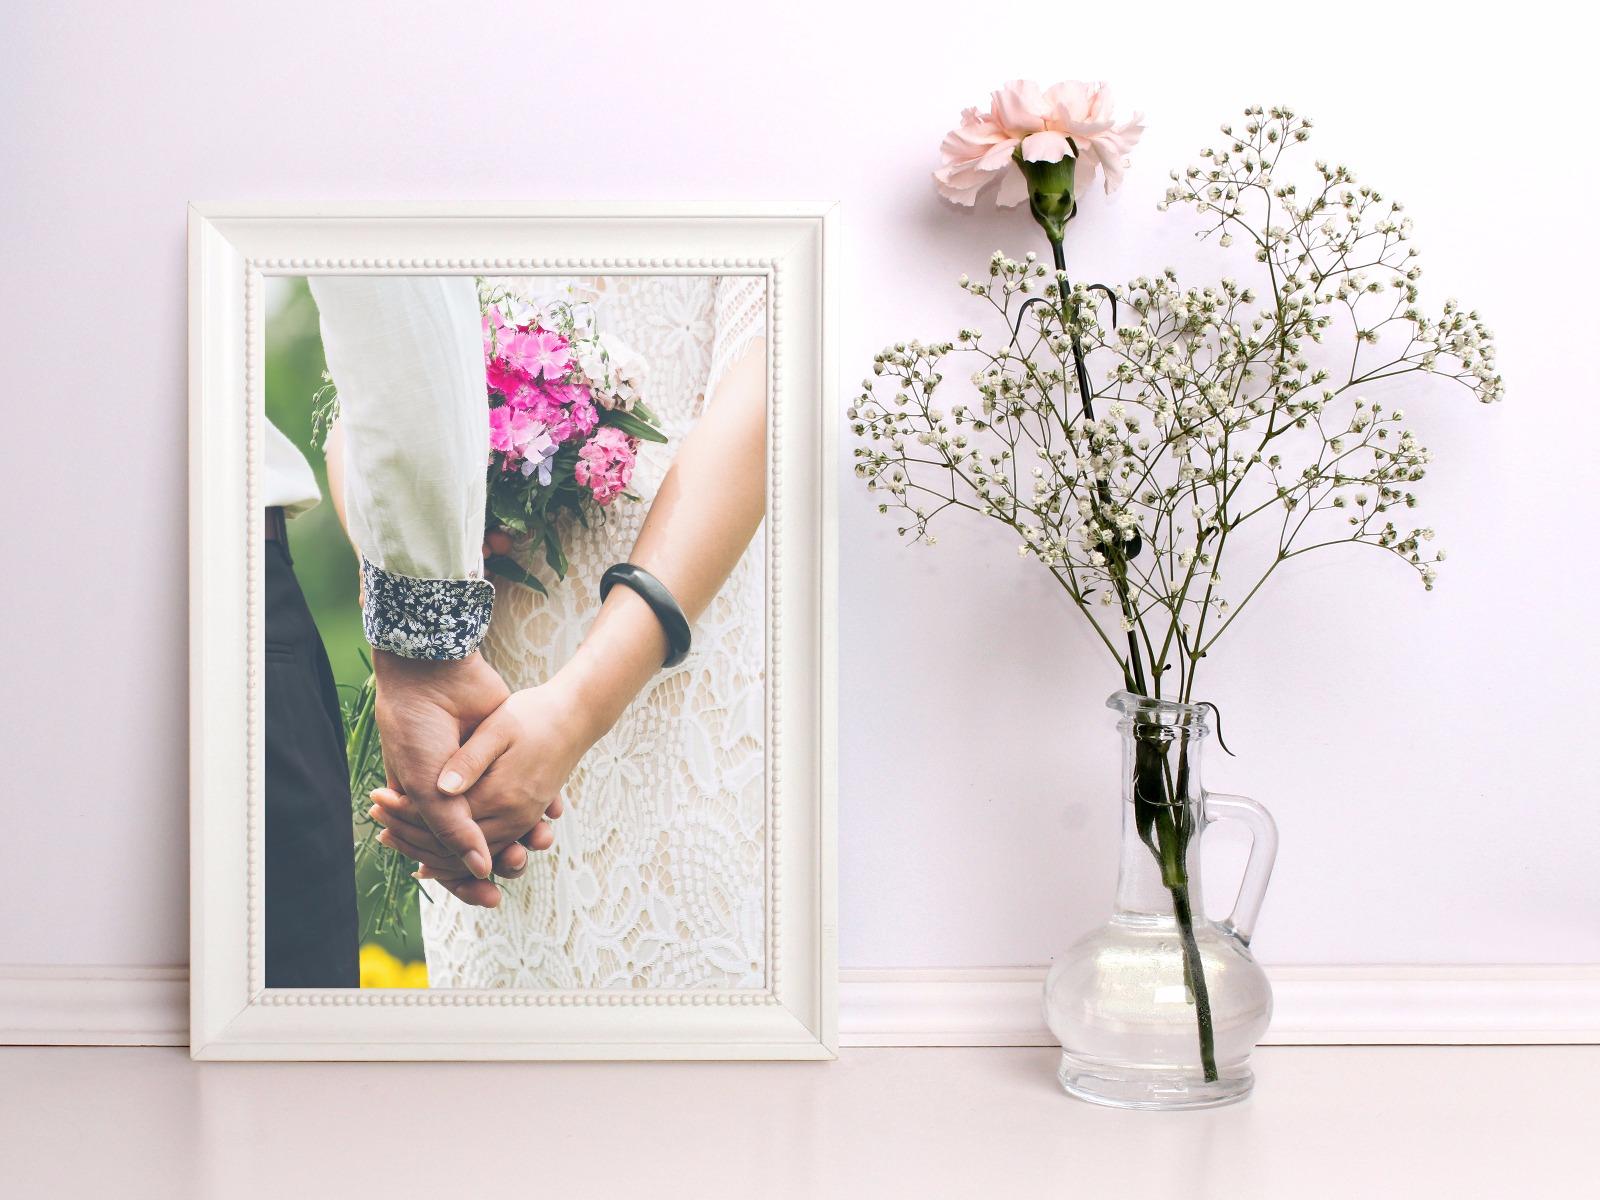 Wedding Frames | Custom Picture Frames